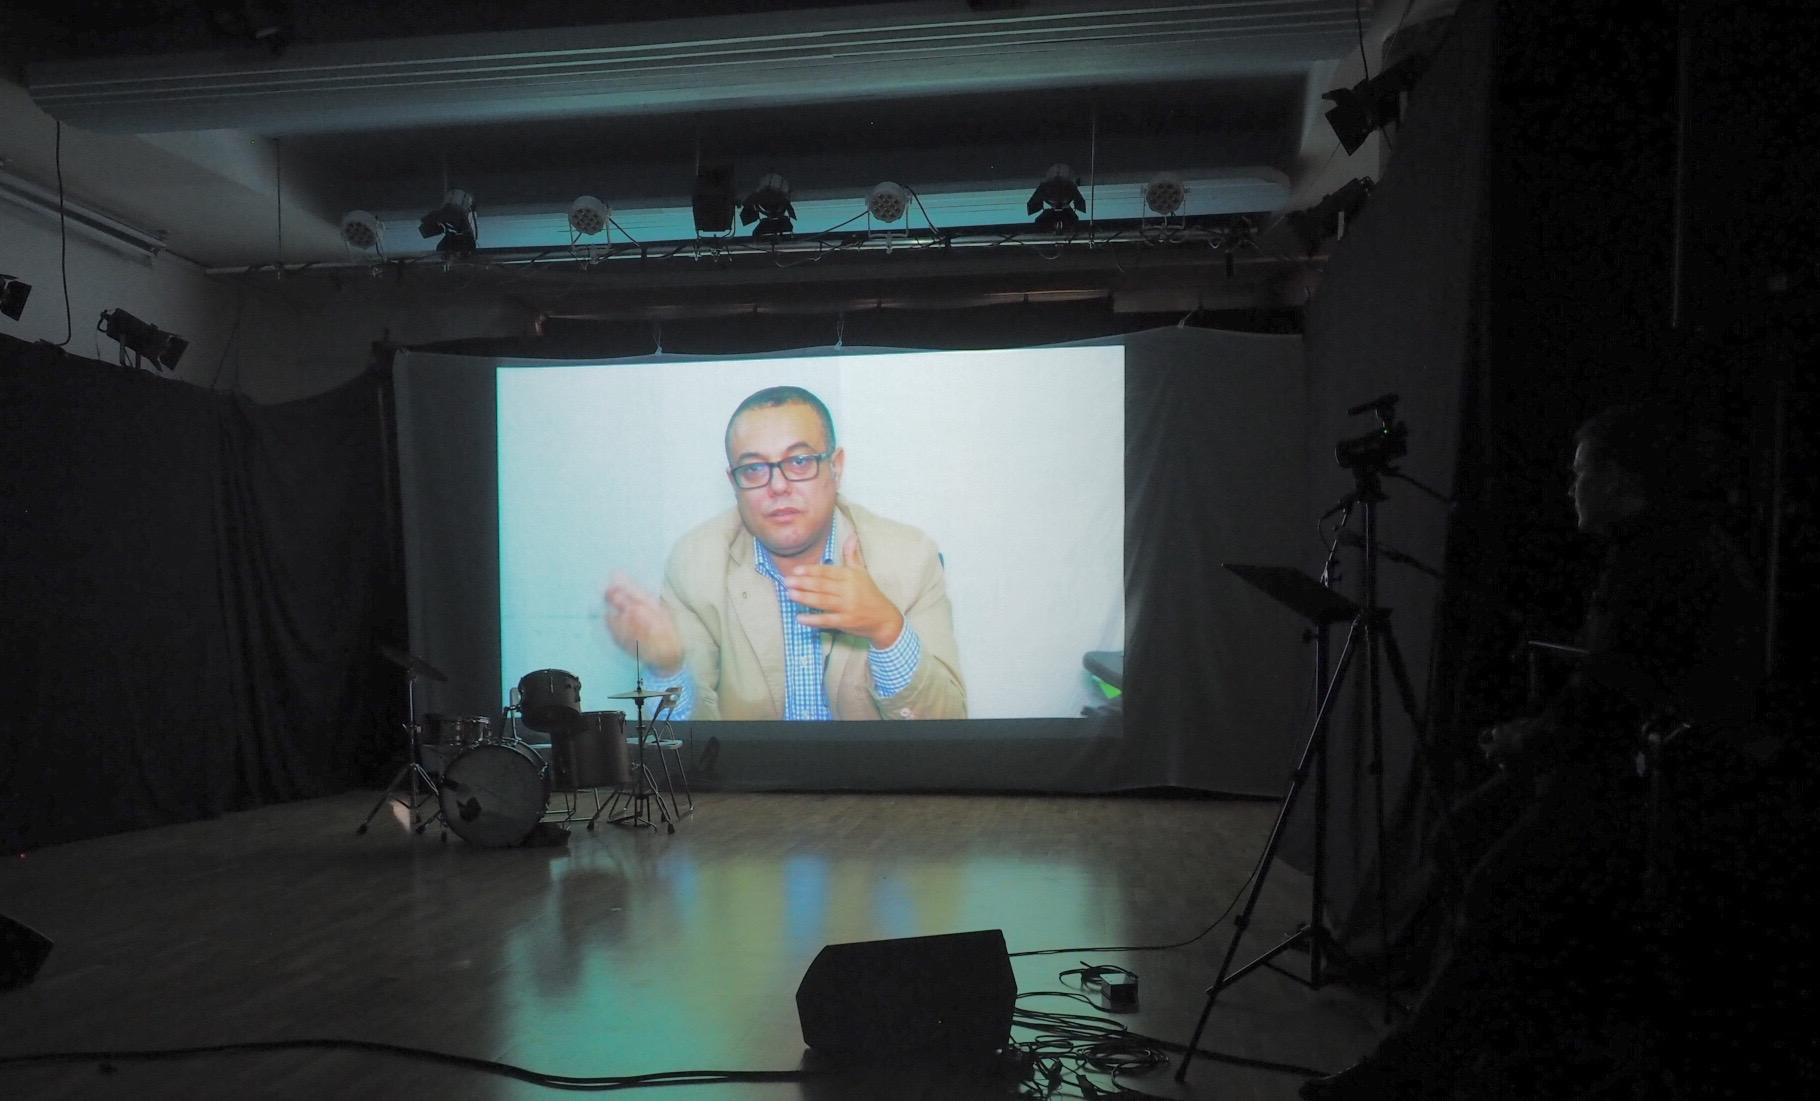 Videogreeting from Gaza